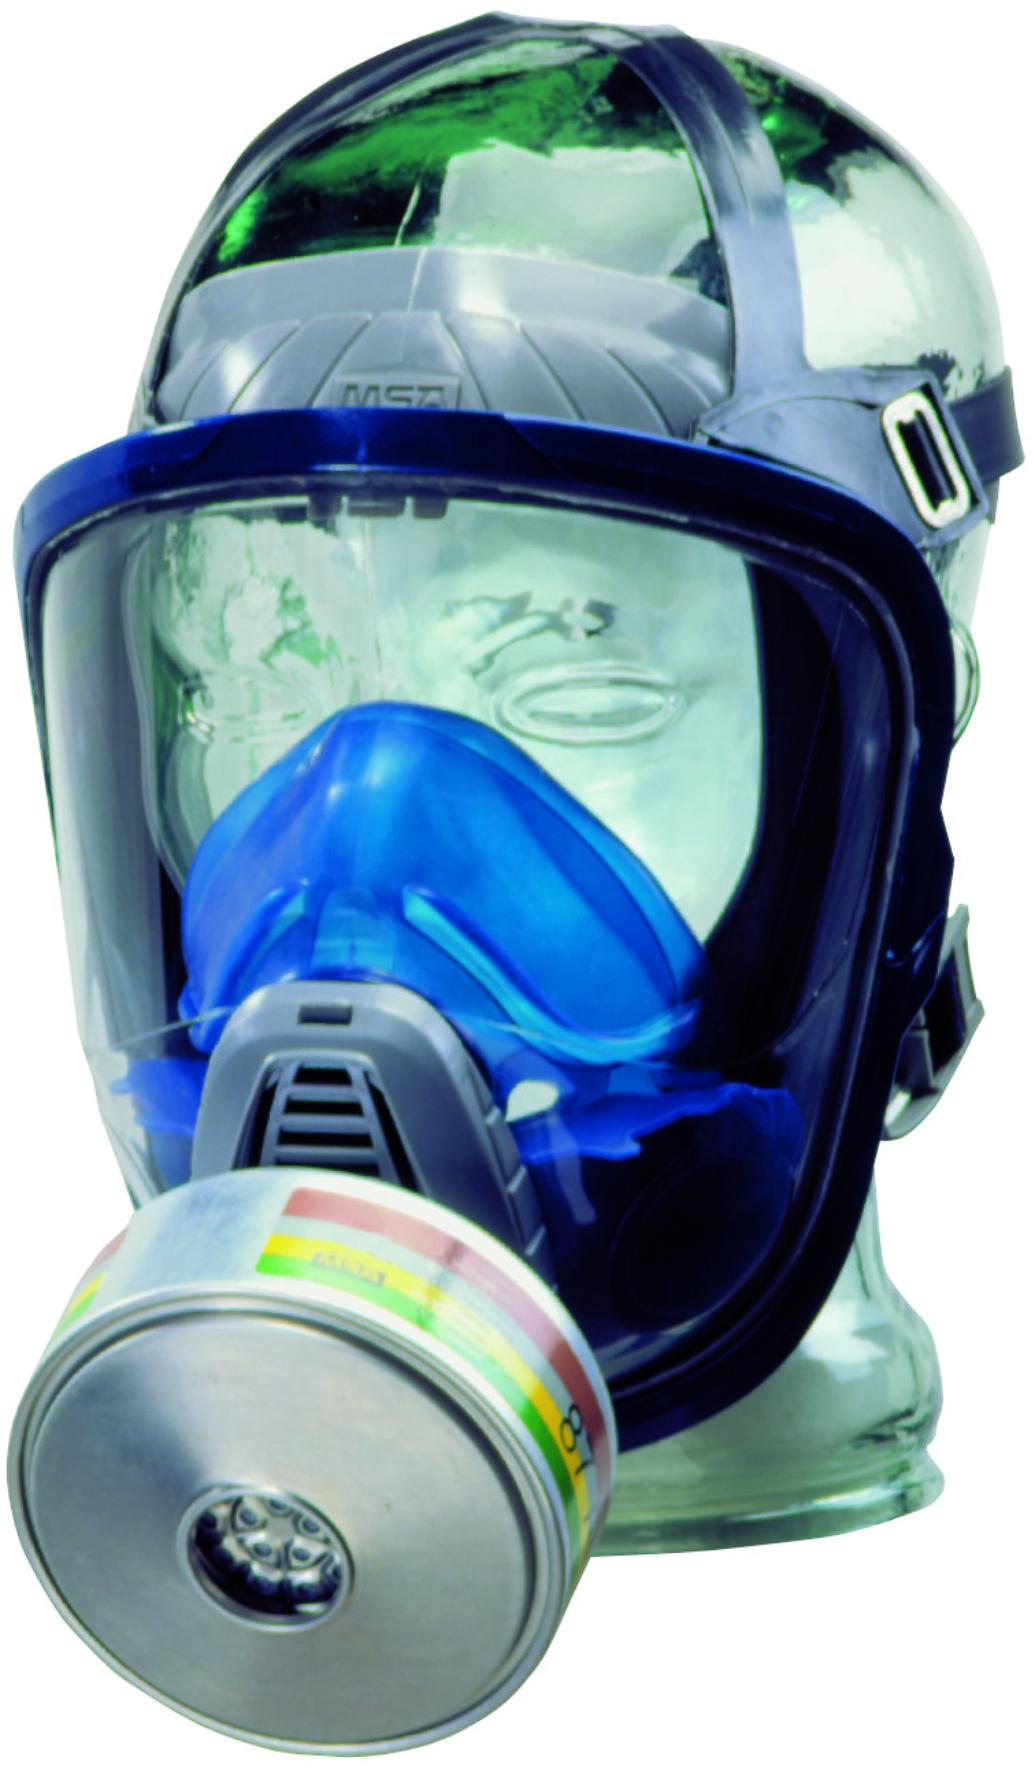 Masque complet Advantage 3000